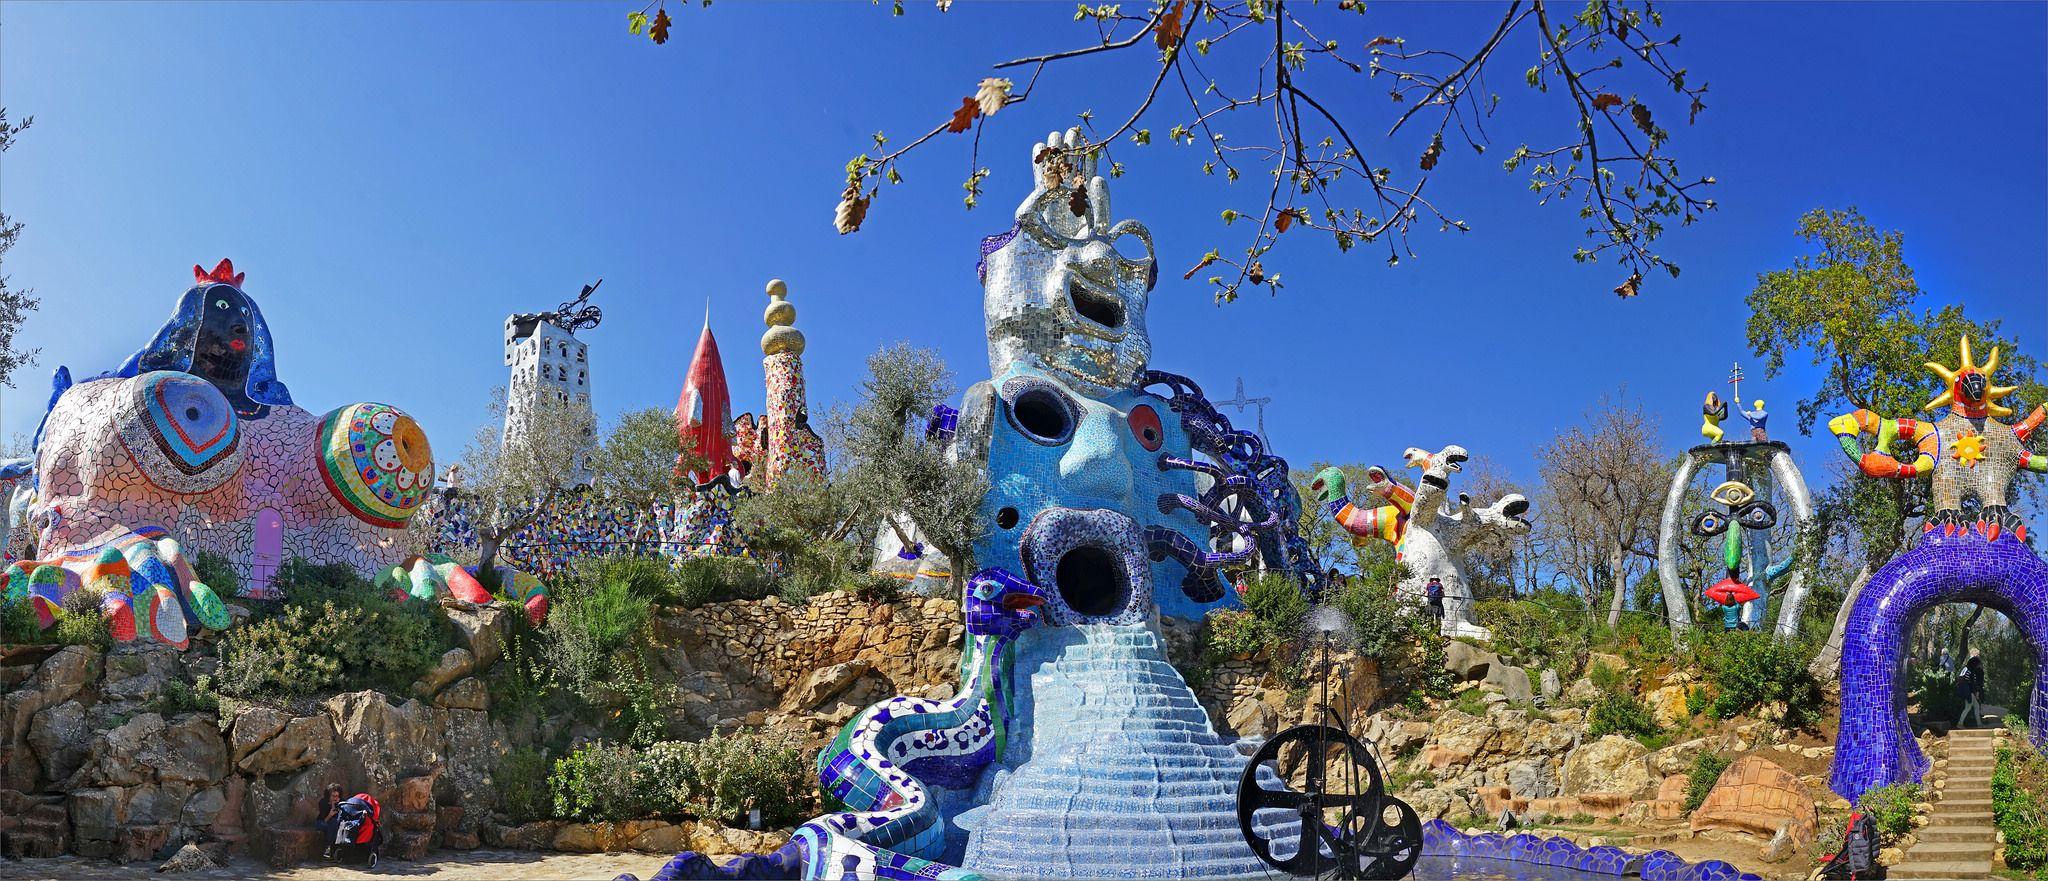 Le Jardin Des Tarots De Niki De Saint Phalle Capalbio Italie Natural Landmarks Landmarks Contemporary Art